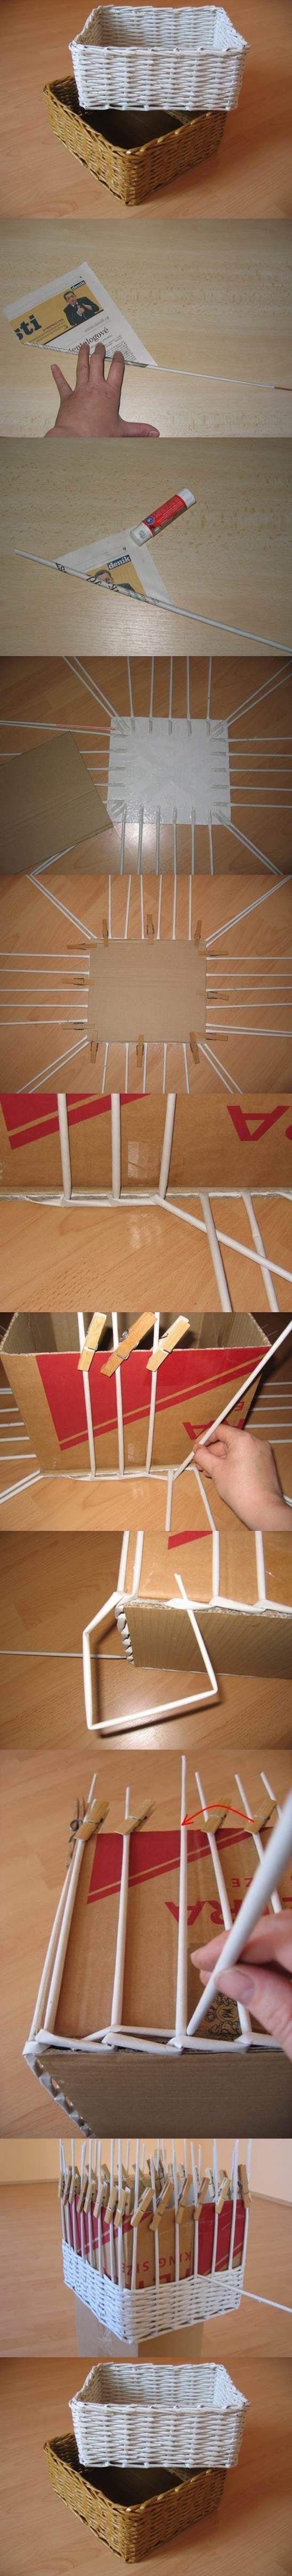 DIY Woven Paper Storage Box   http://iCreativeIdeas.com Follow Us on Facebook --> https://www.facebook.com/icreativeideas